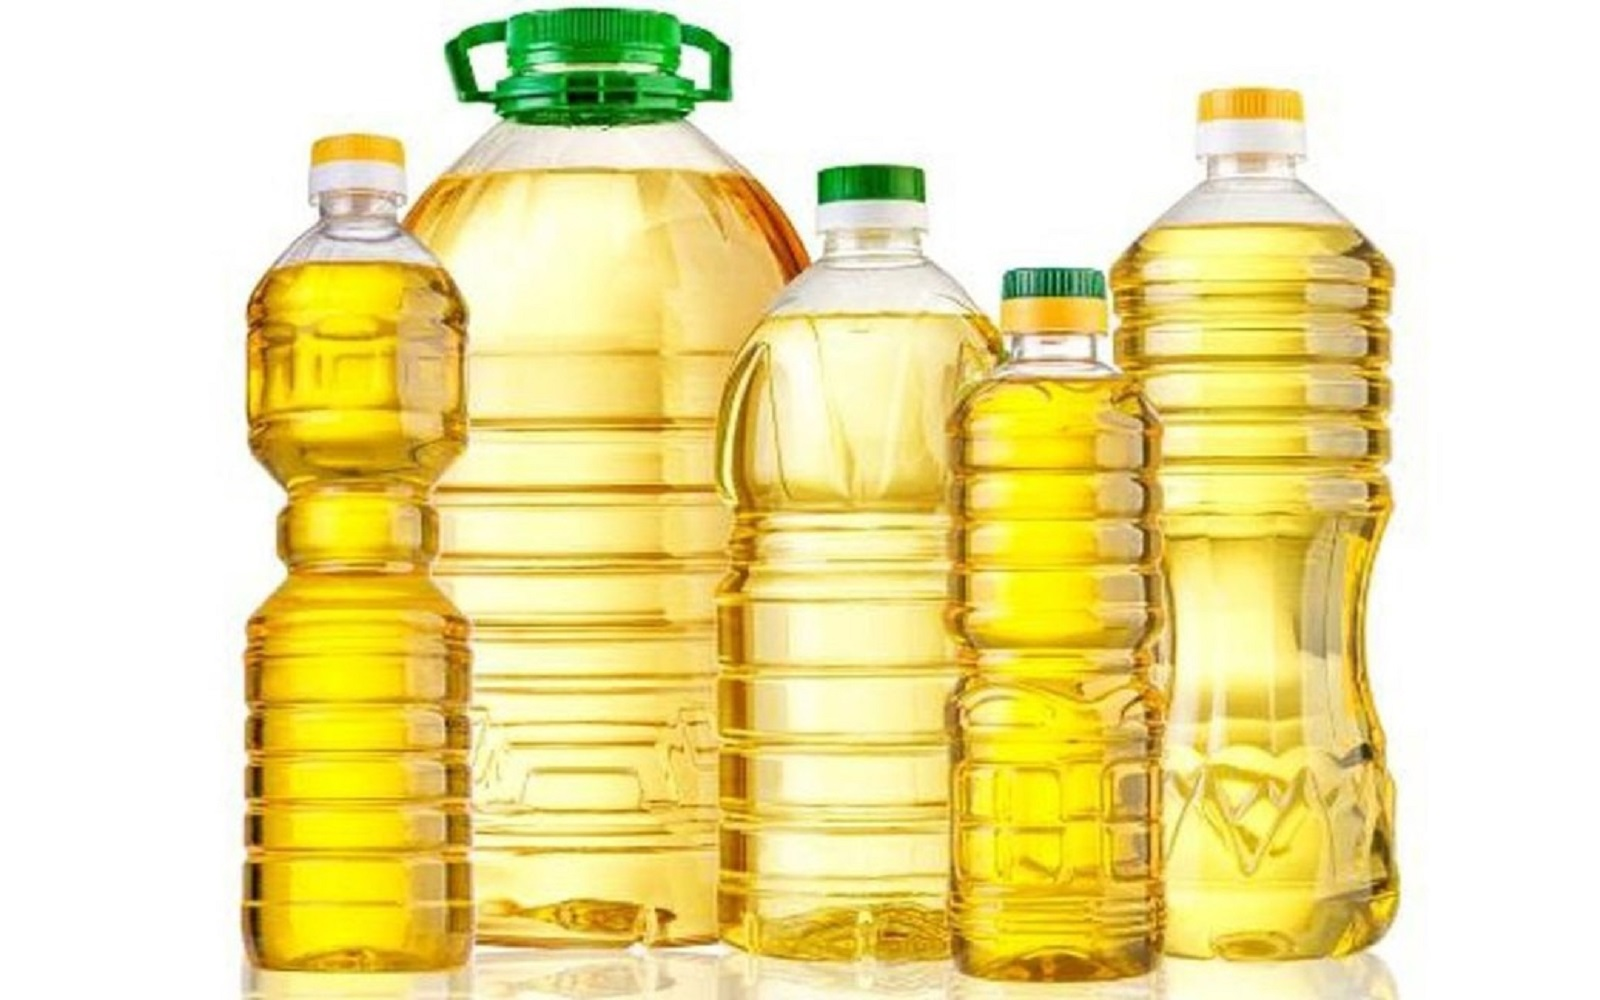 these brand of vegetable oil battle for market share